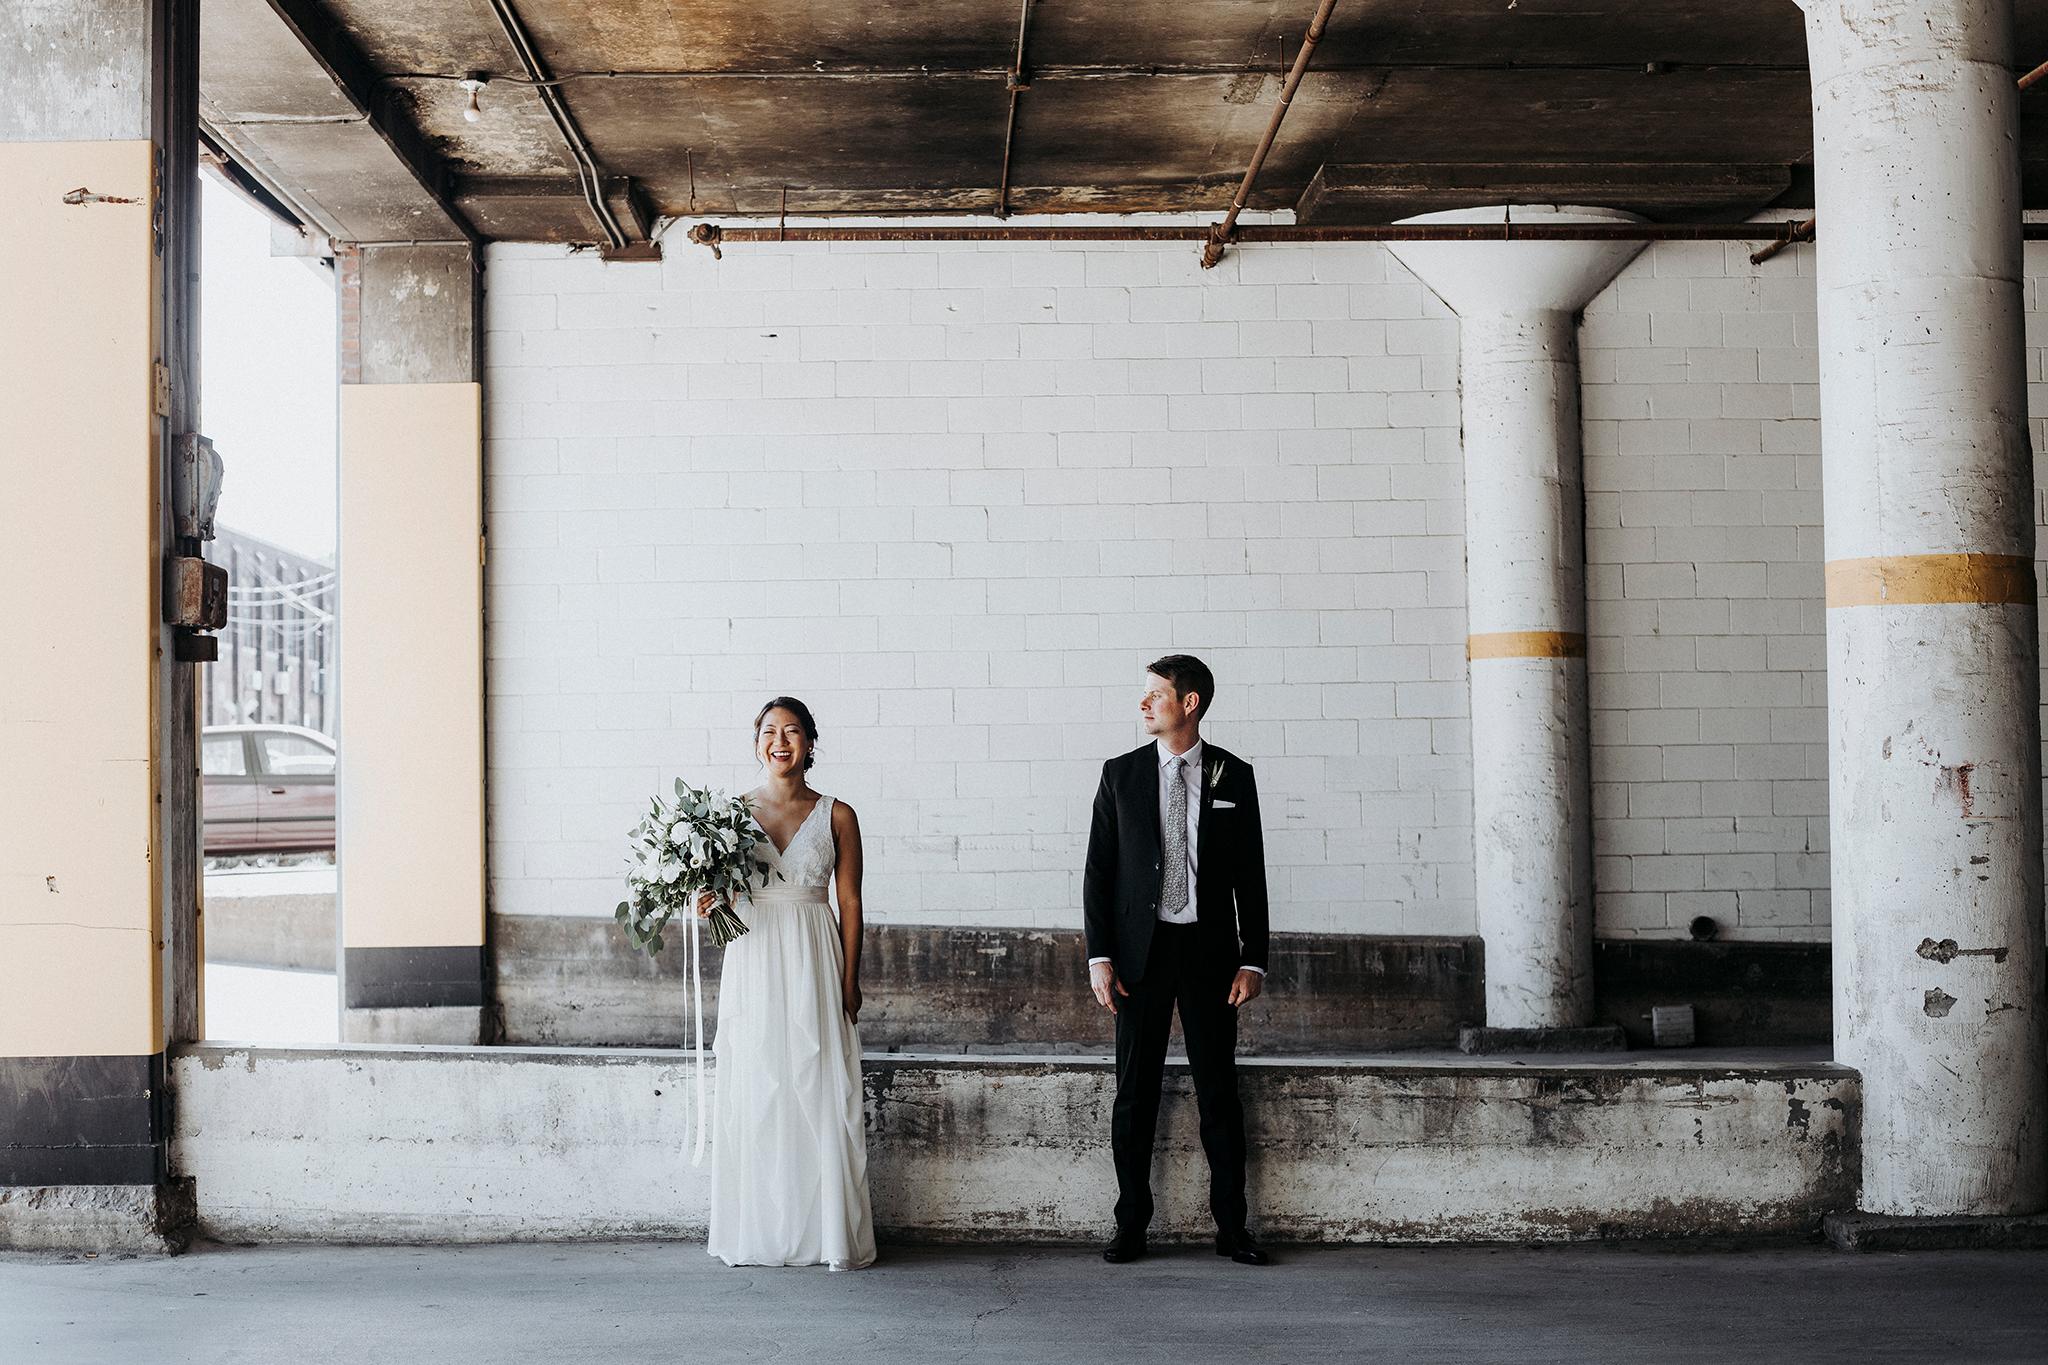 Christine & Andrew - Toronto, ON